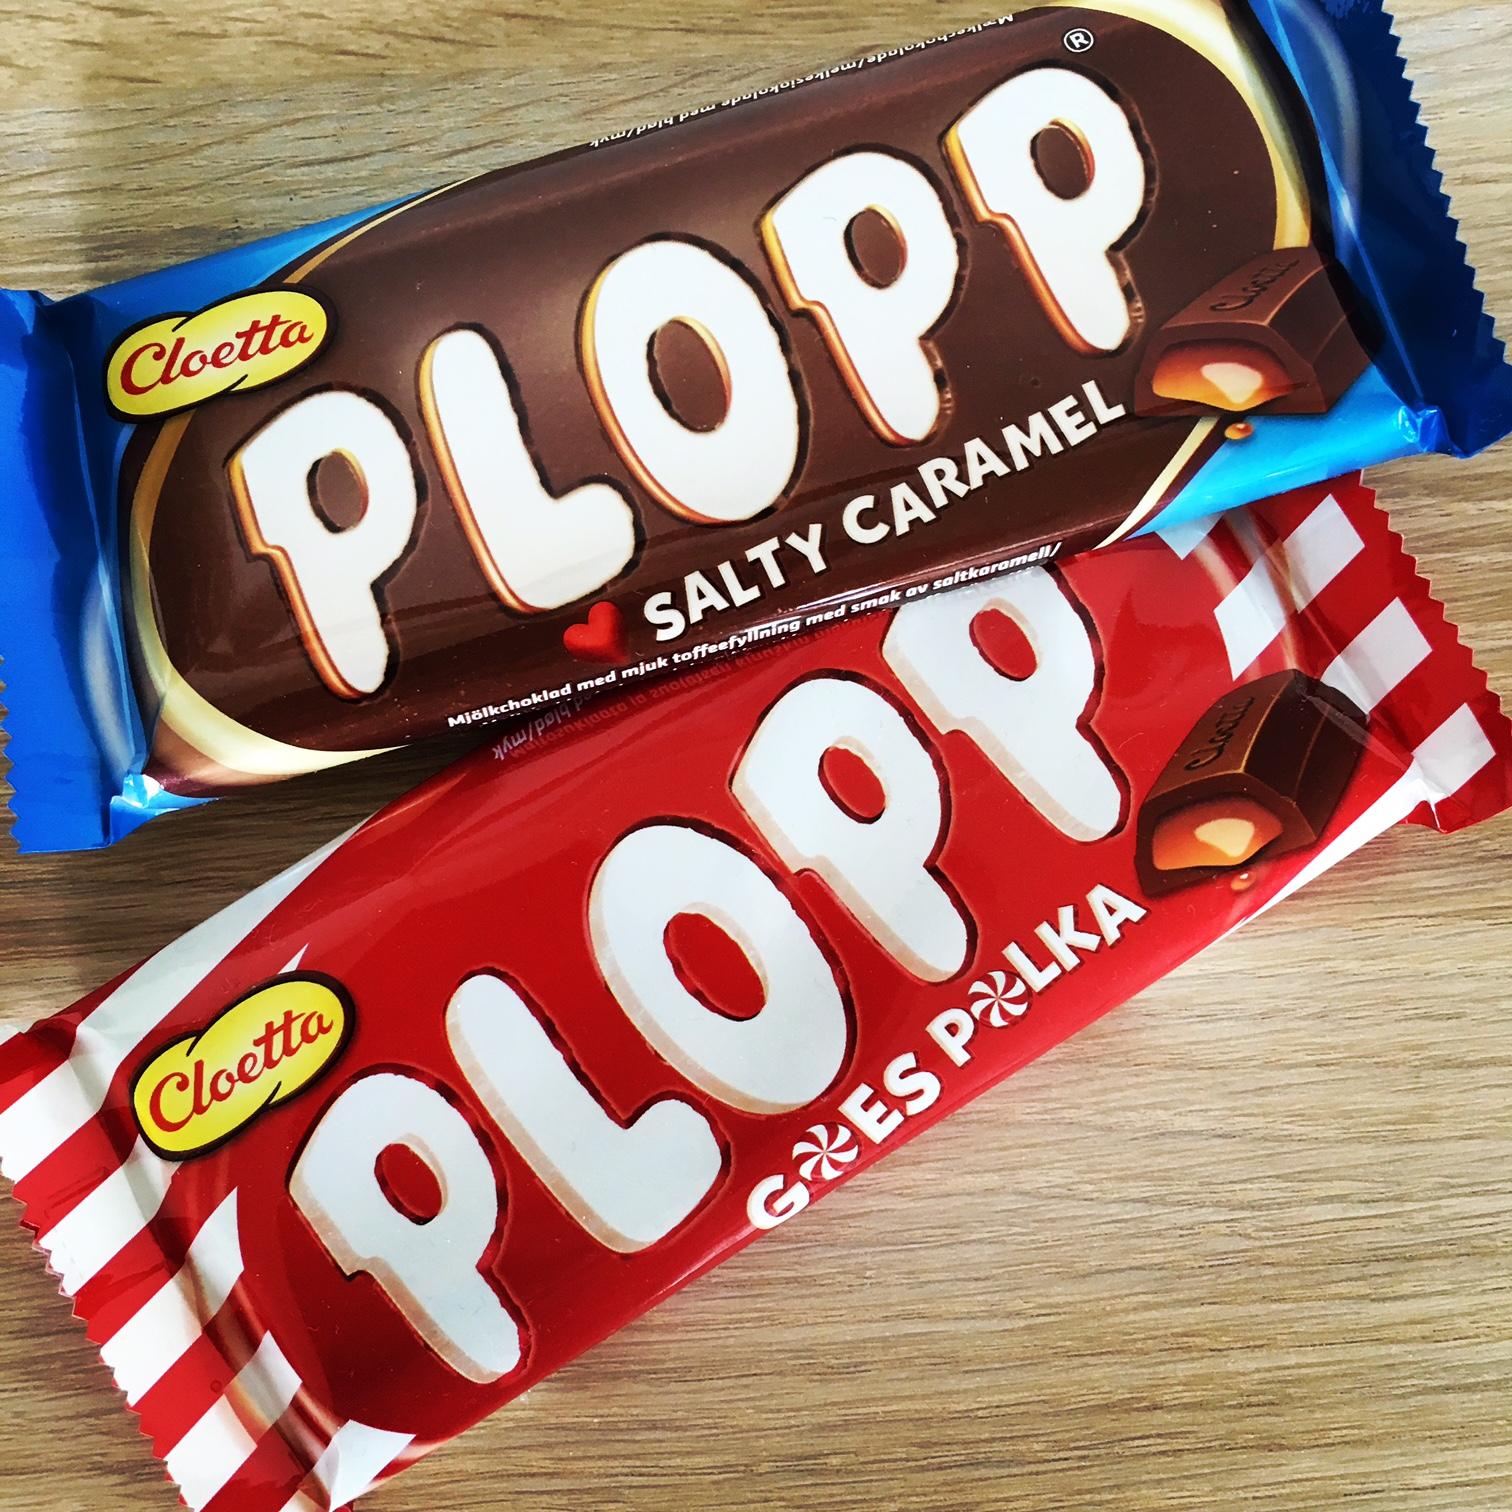 Cloetta Plopp Salty Caramel, Goes Polka